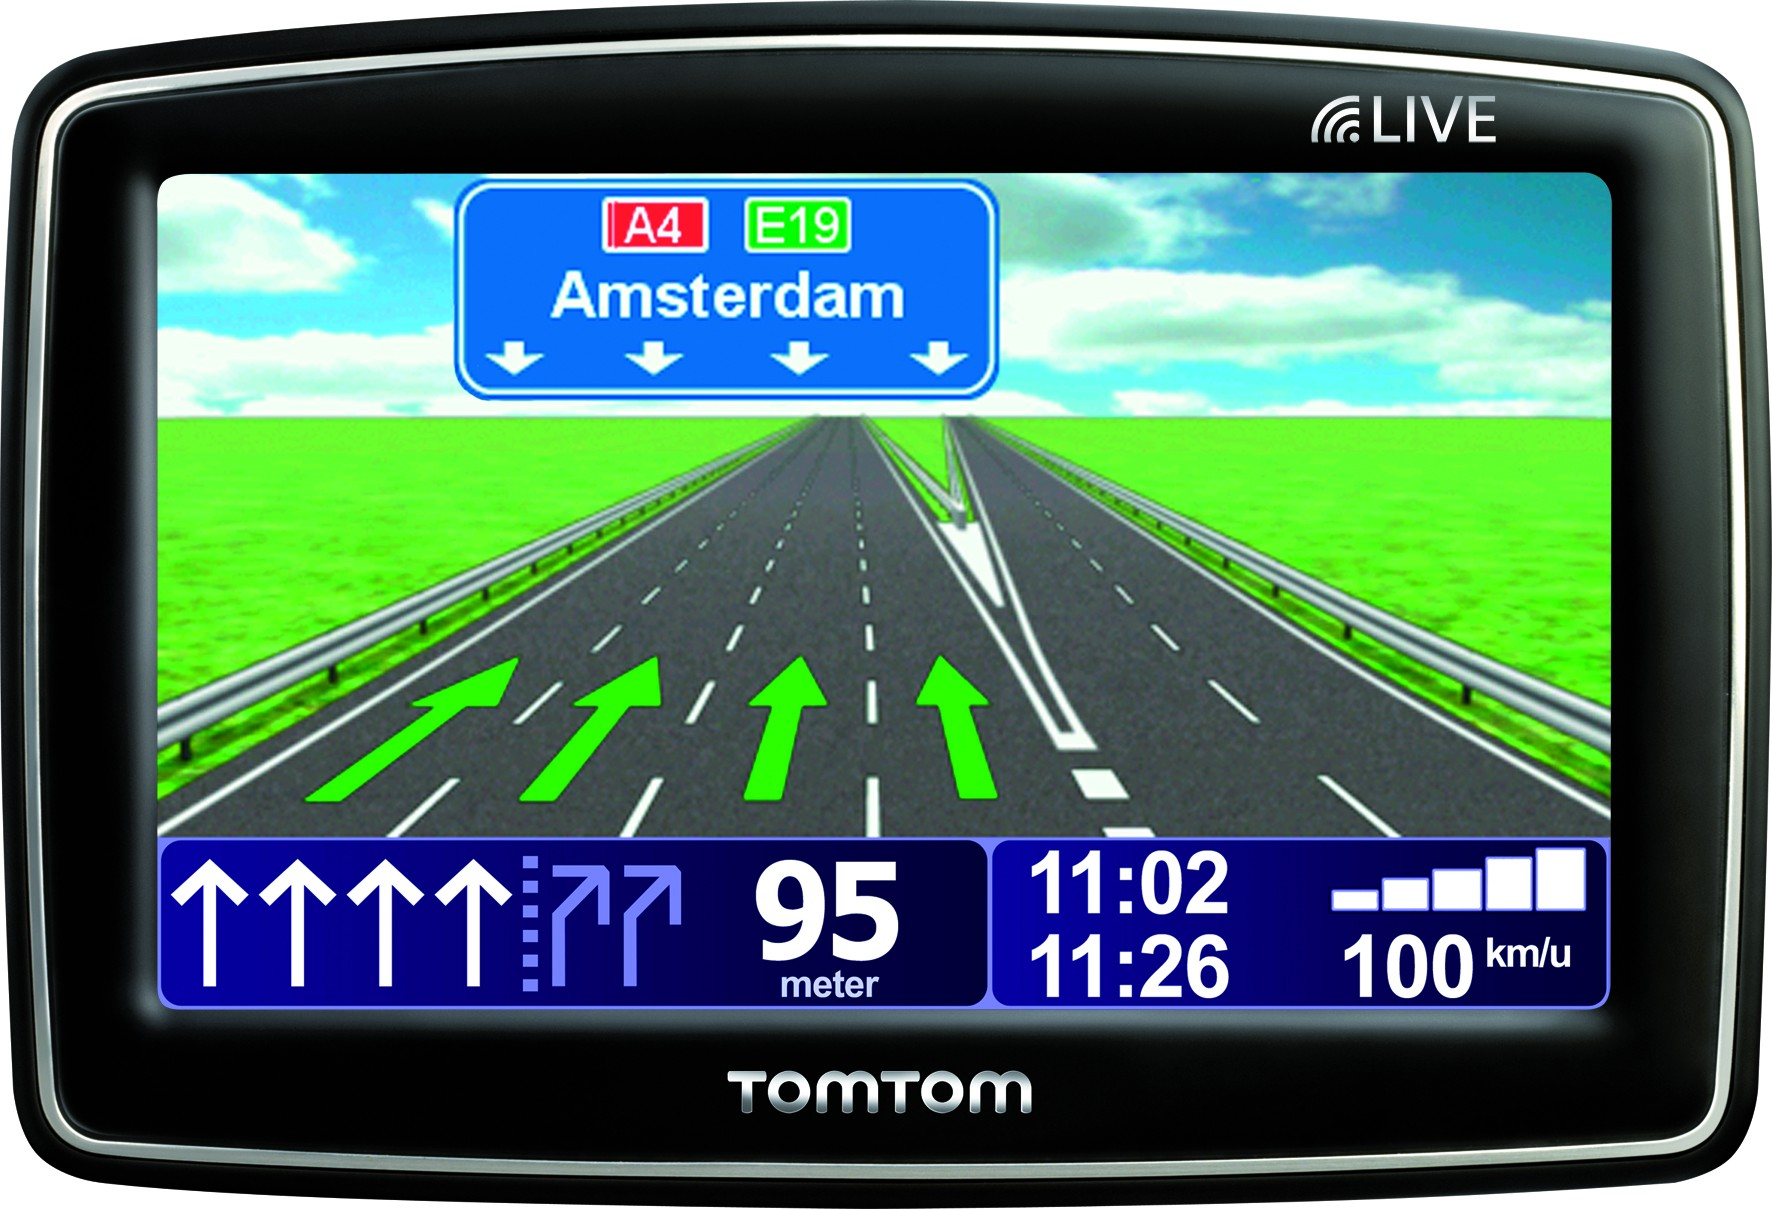 tom tom garmin best sat nav tech fogey tech fogey rh techfogey com TomTom XL N14644 TomTom One Manual